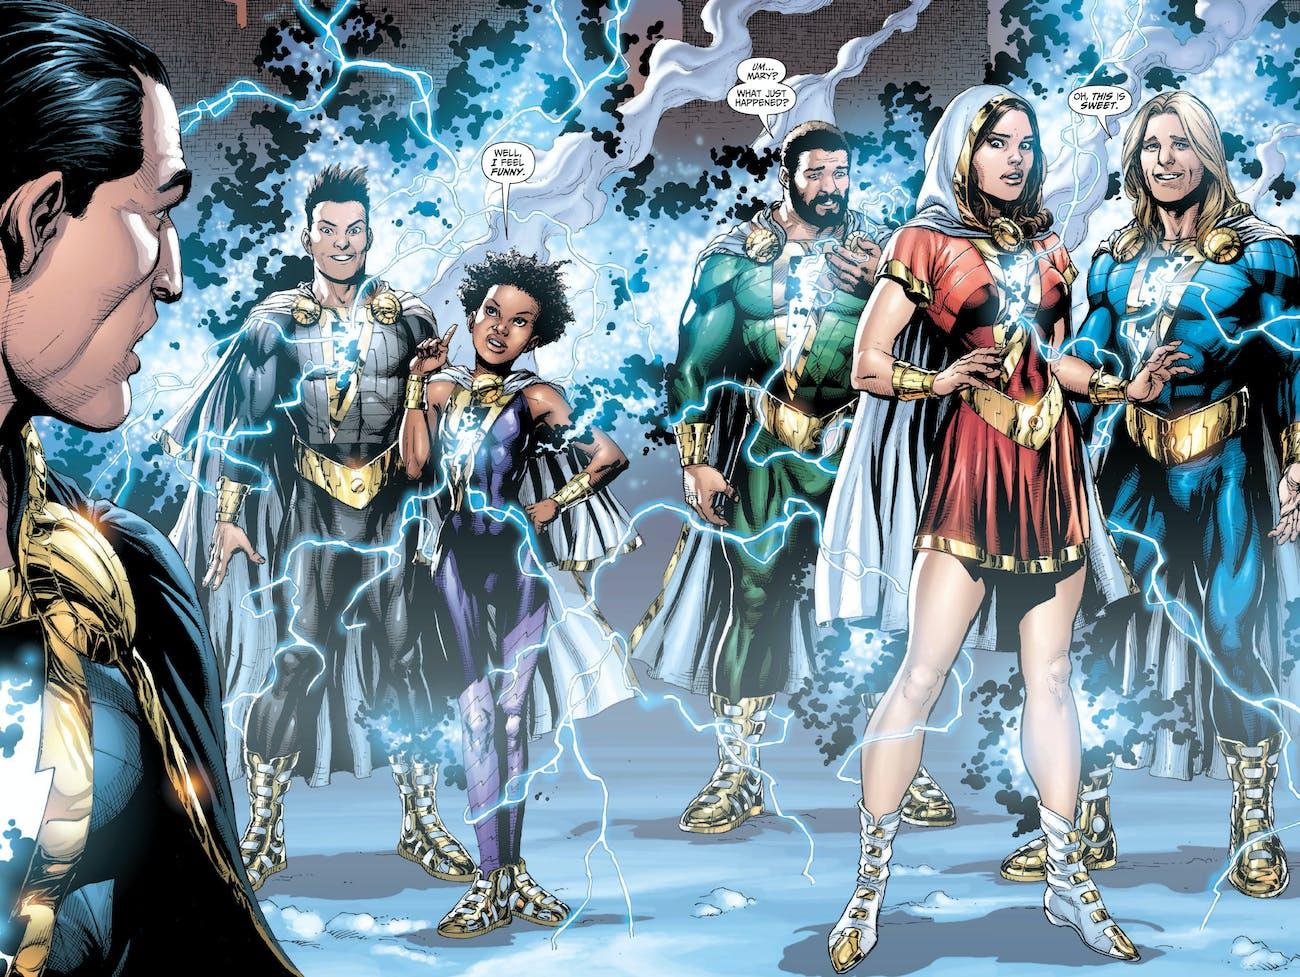 Shazam!' Ending Explained, Spoilers: Meet the Shazam Family | Inverse